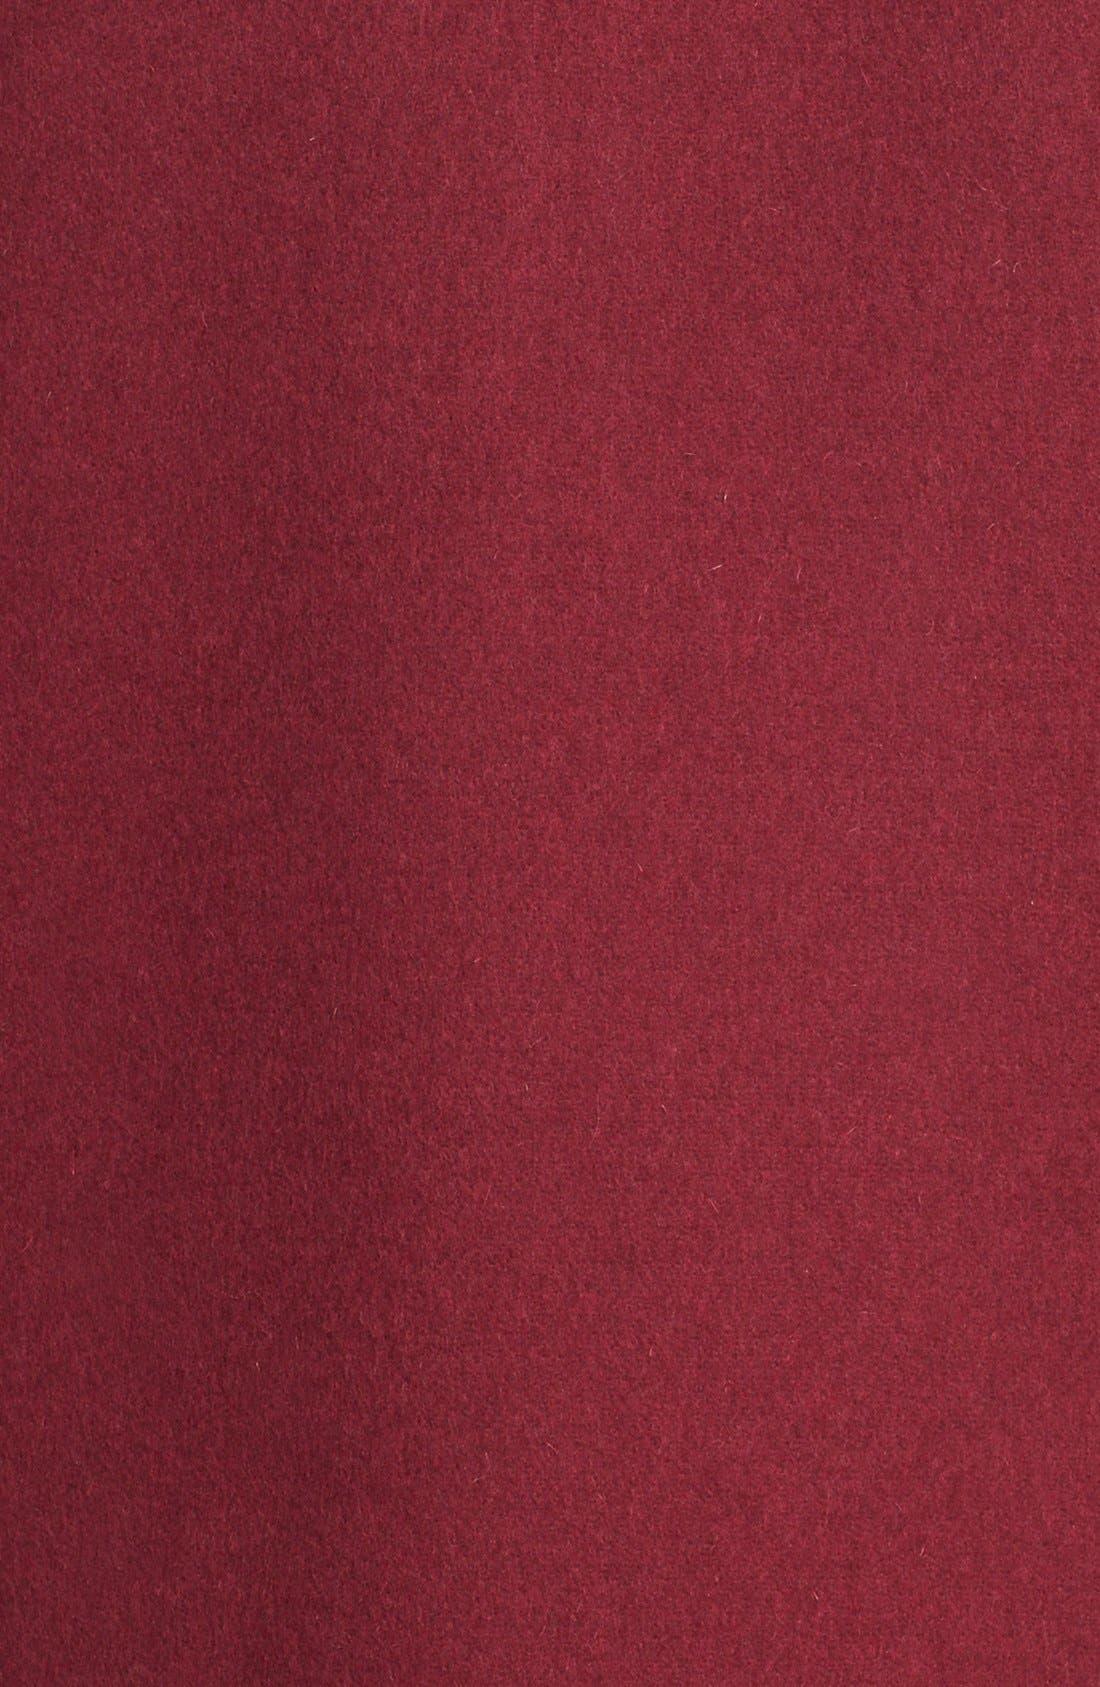 Alternate Image 3  - Burberry 'Baysbrooke' Wool Duffle Coat